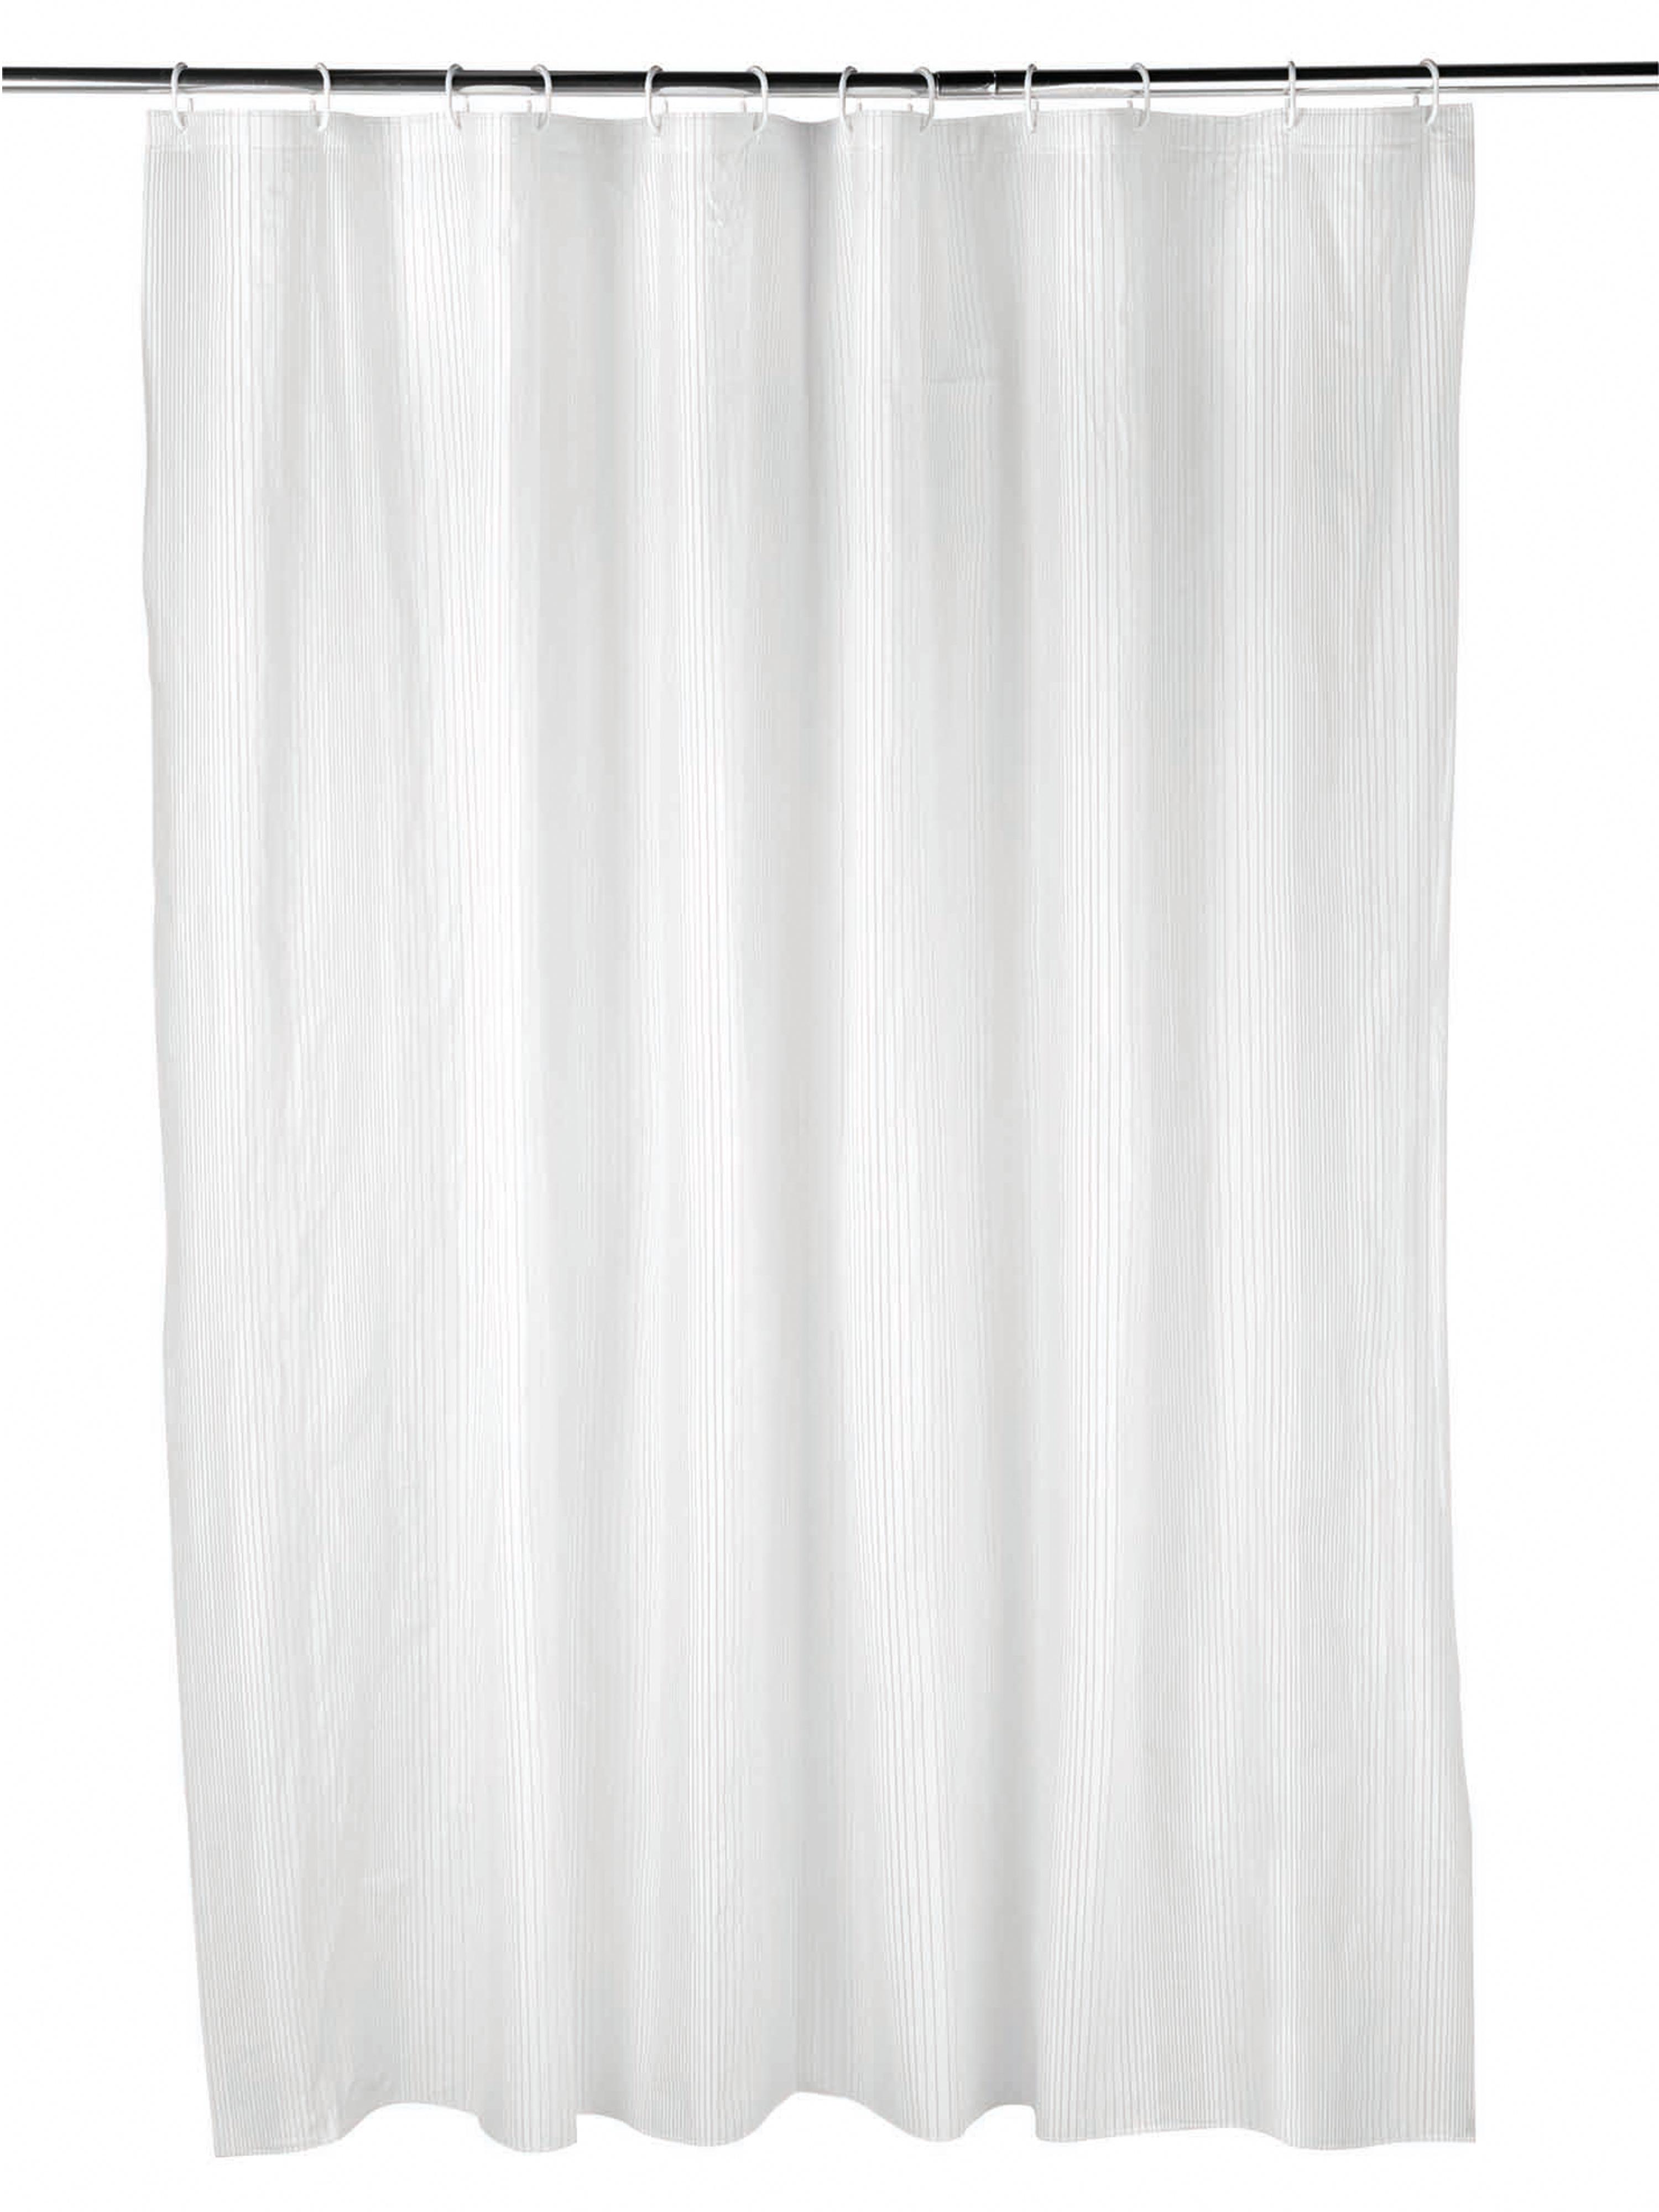 Beldray Boston Striped Shower Curtain With Hooks 180 X 180cm Peva White